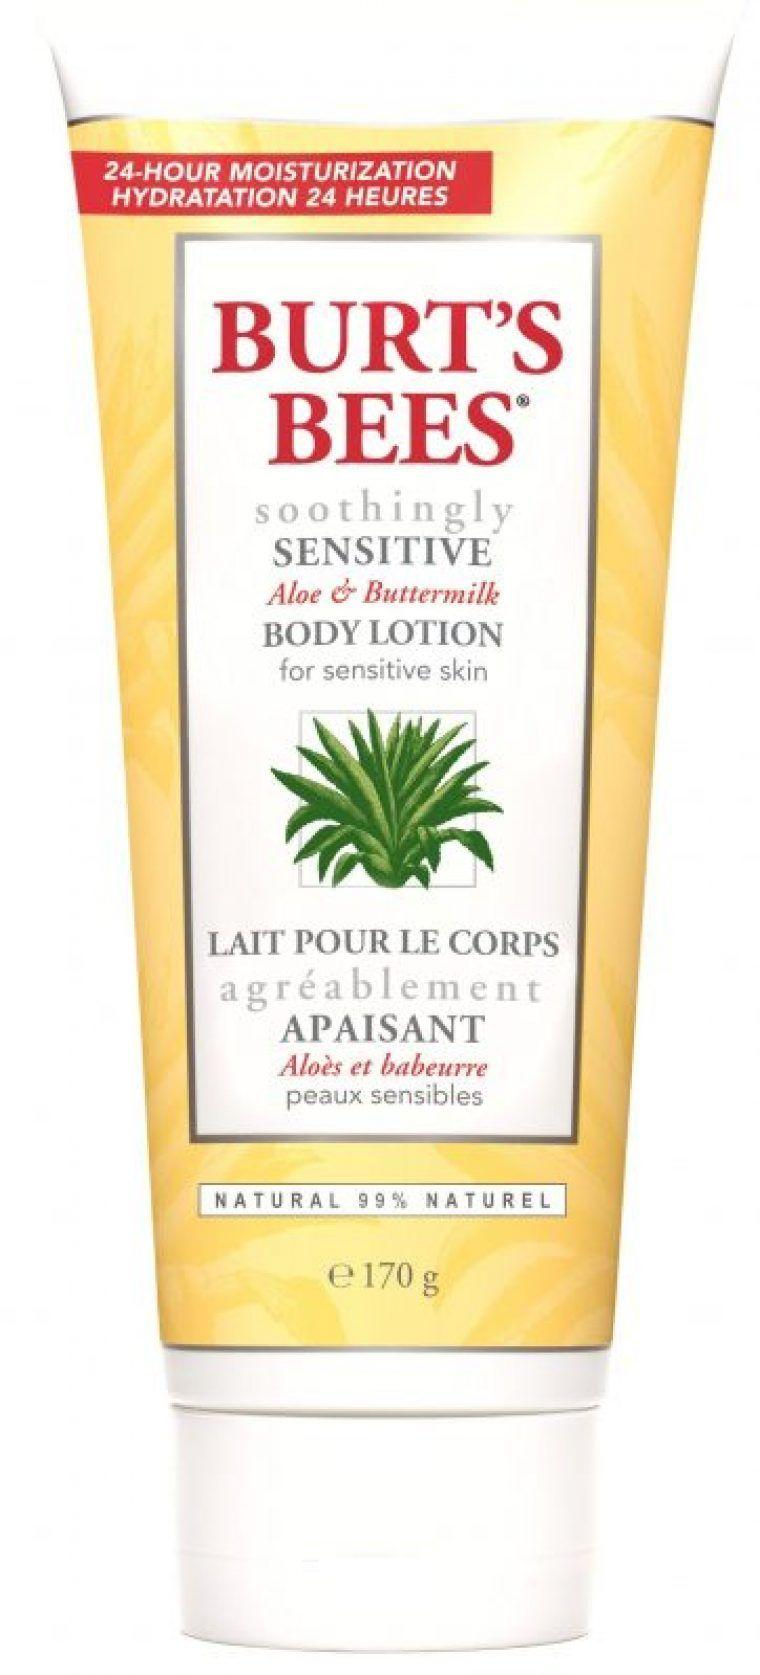 Aloe buttermilk body lotion burts bees ca body